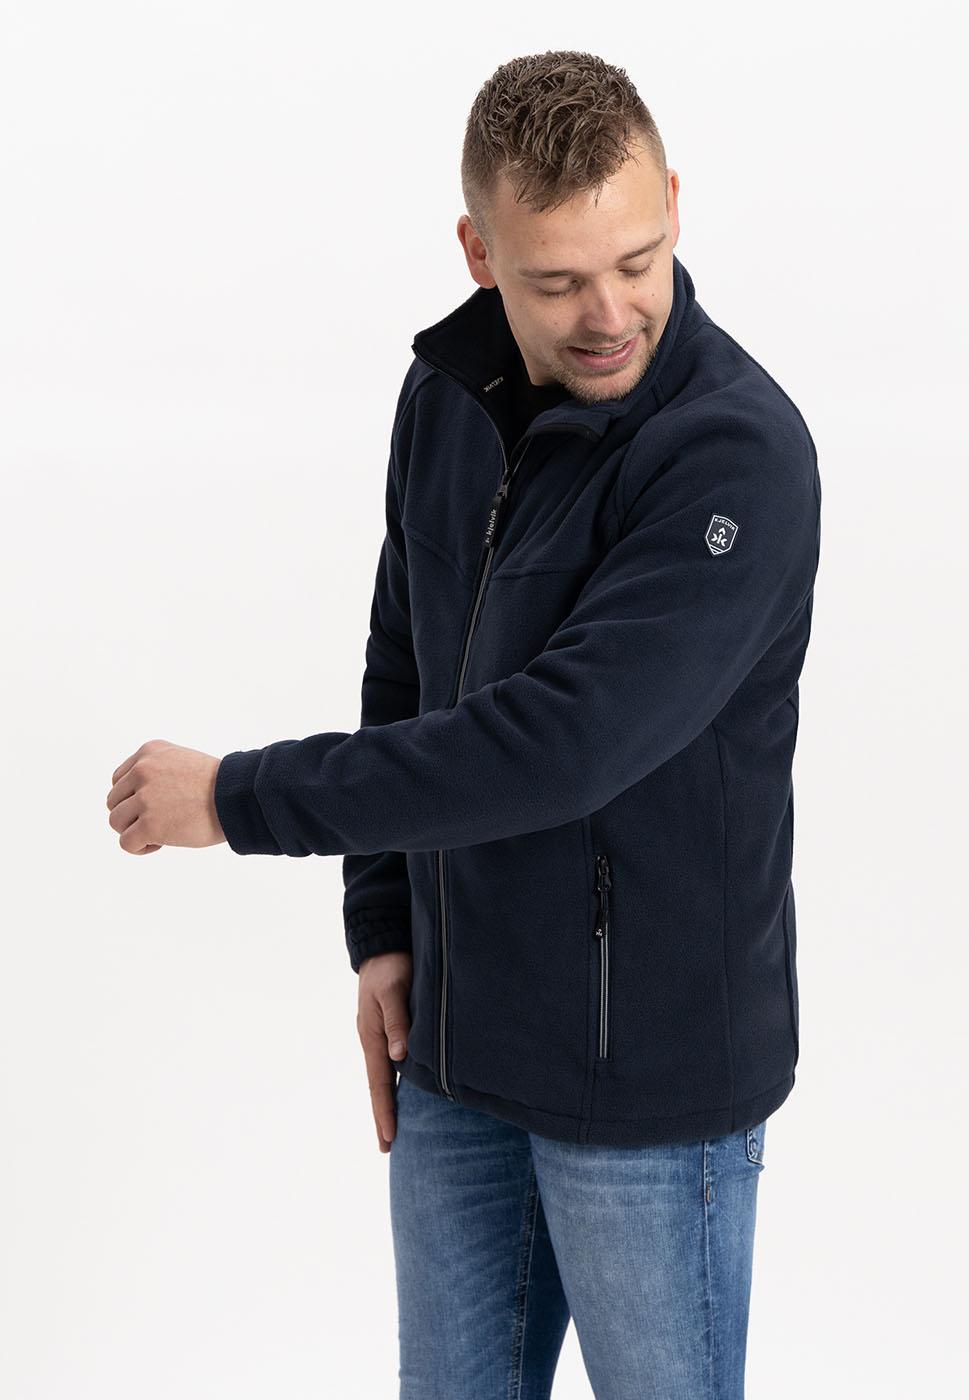 Kjelvik Scandinavian Clothing - Men Knitwear/Fleece Fjord Navy